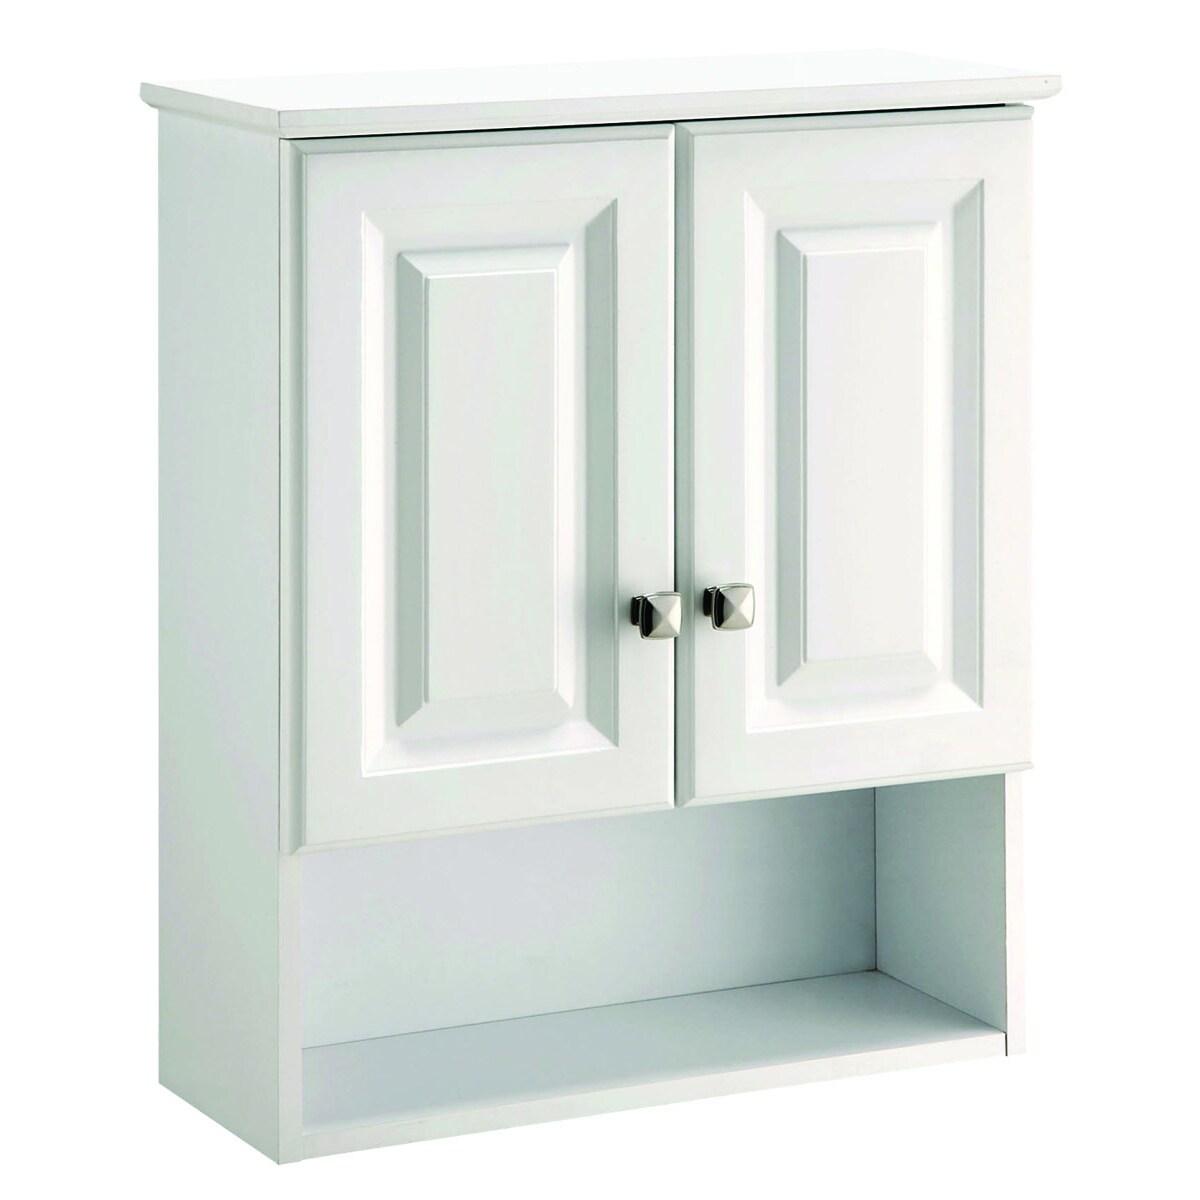 Shop Design House 531715 Wyndham White Semi-gloss Bathroom Wall ...